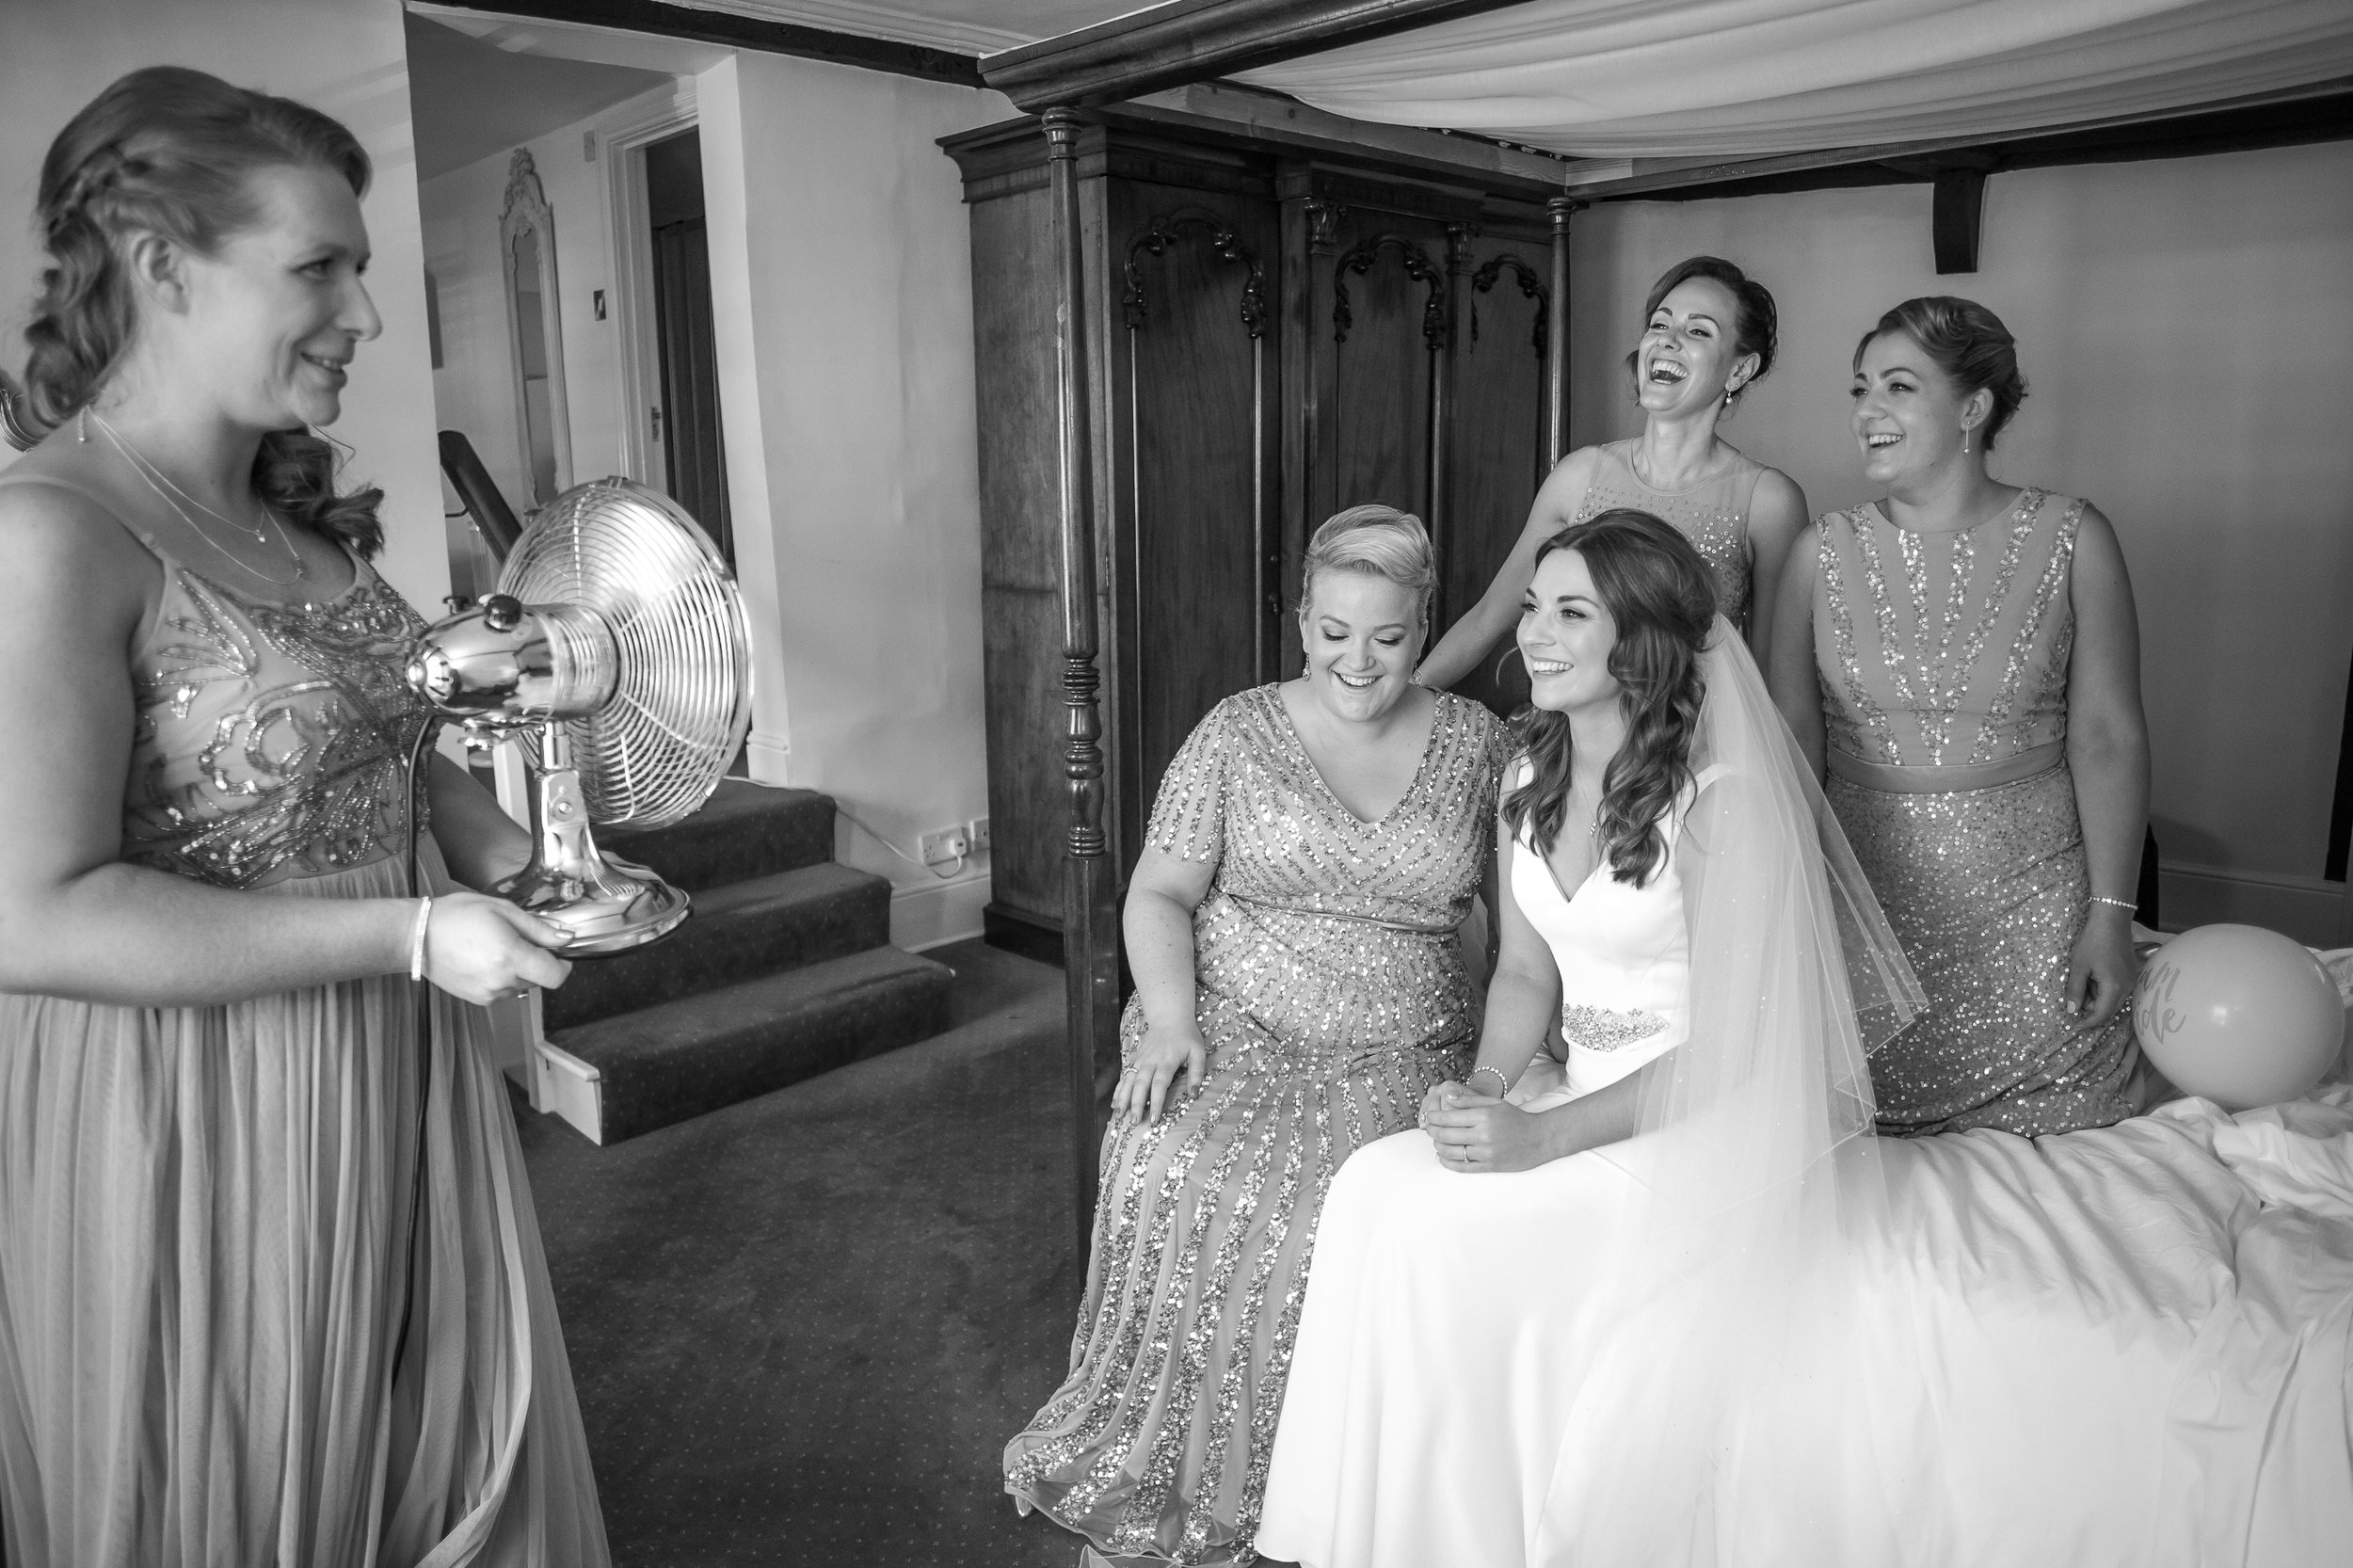 Grittenham Barn female wedding photographers west sussex petworth social-27.jpg